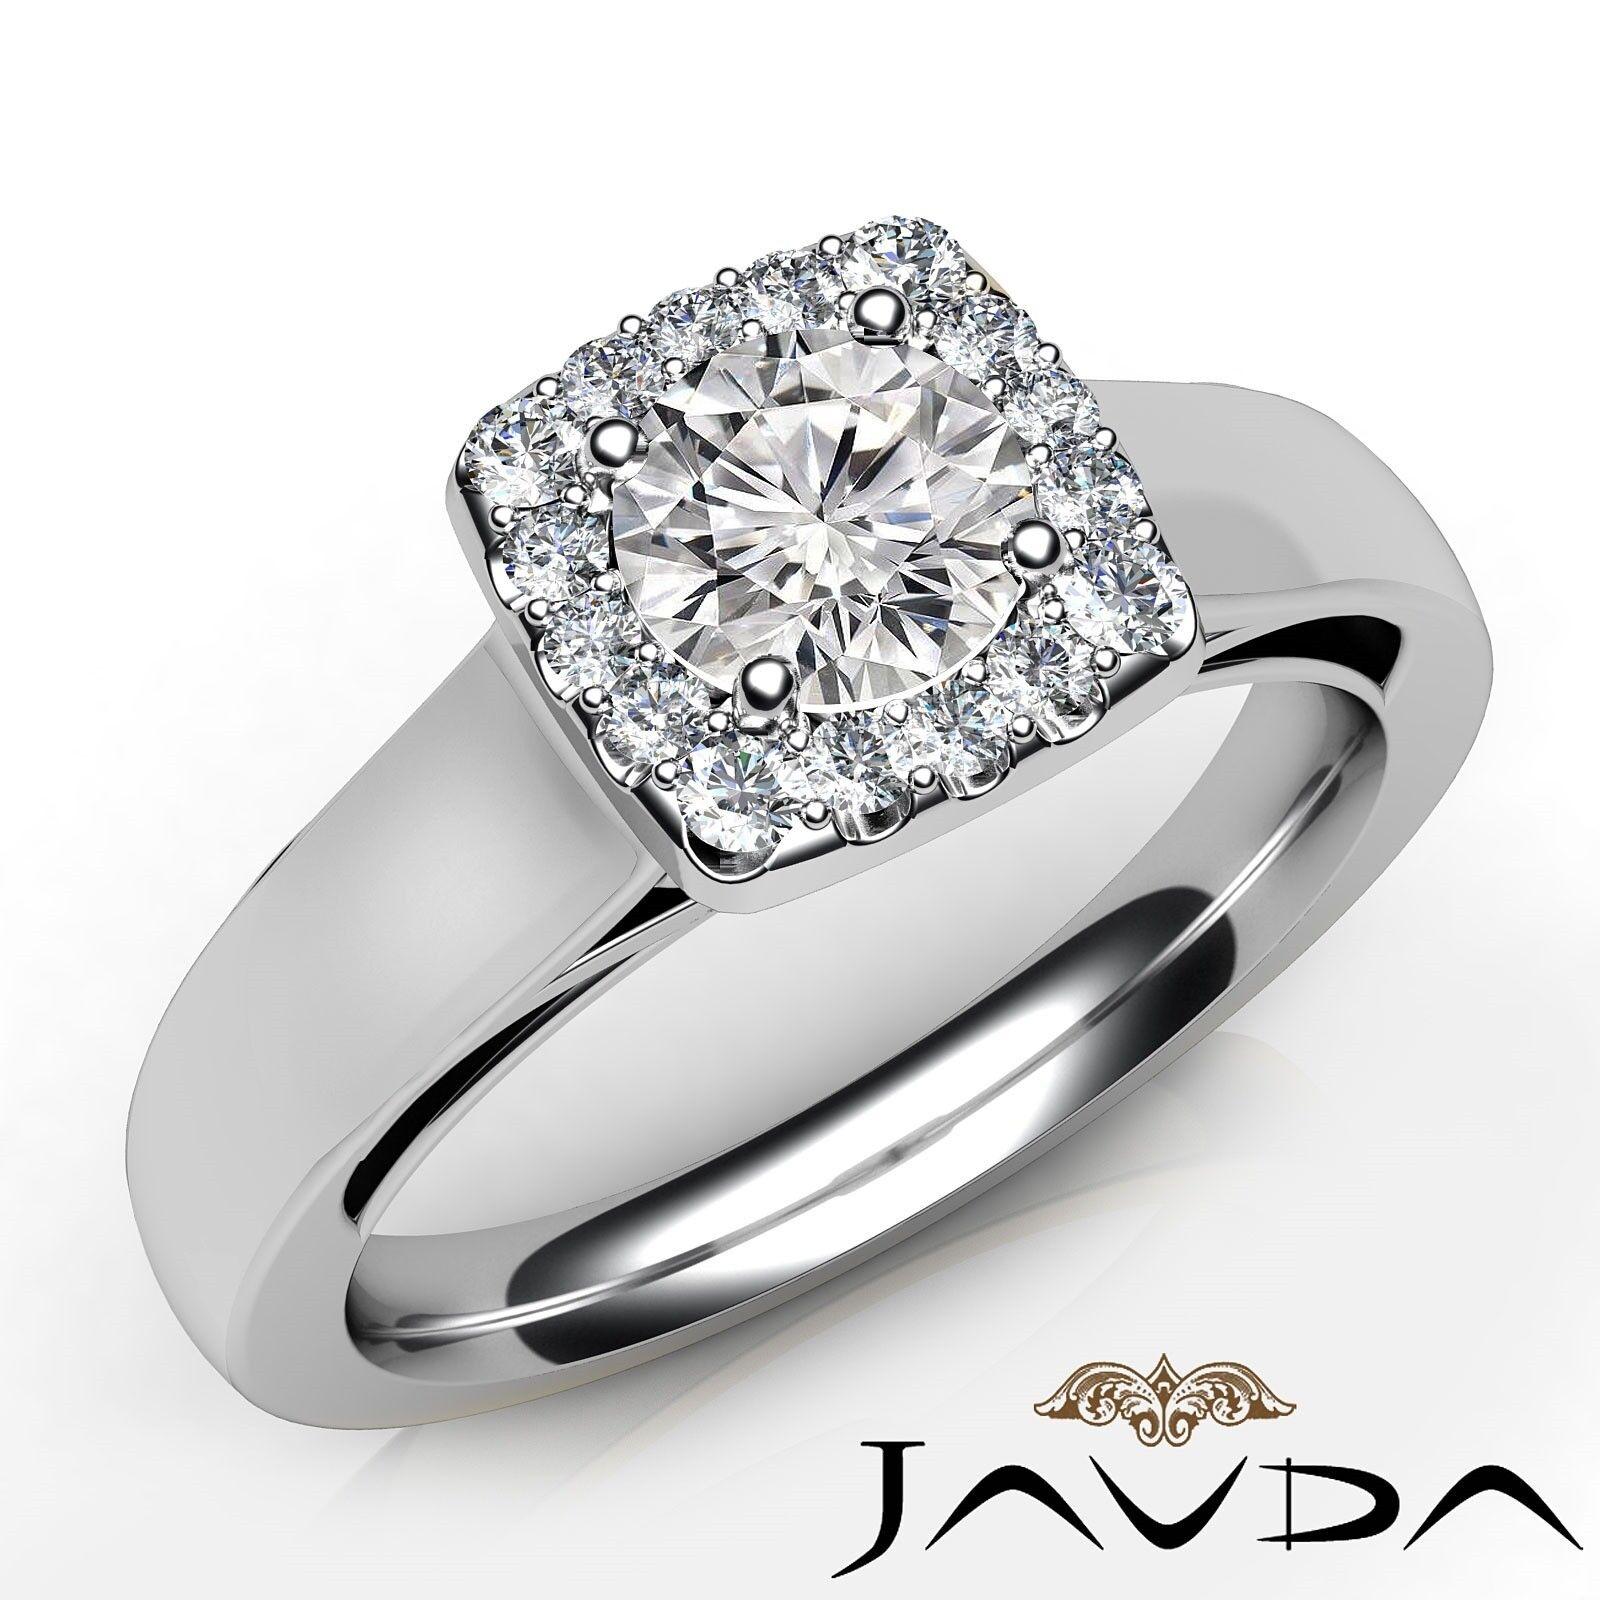 0.65ctw Halo Pave Set Round Diamond Engagement Ring GIA H-VVS2 White Gold Rings